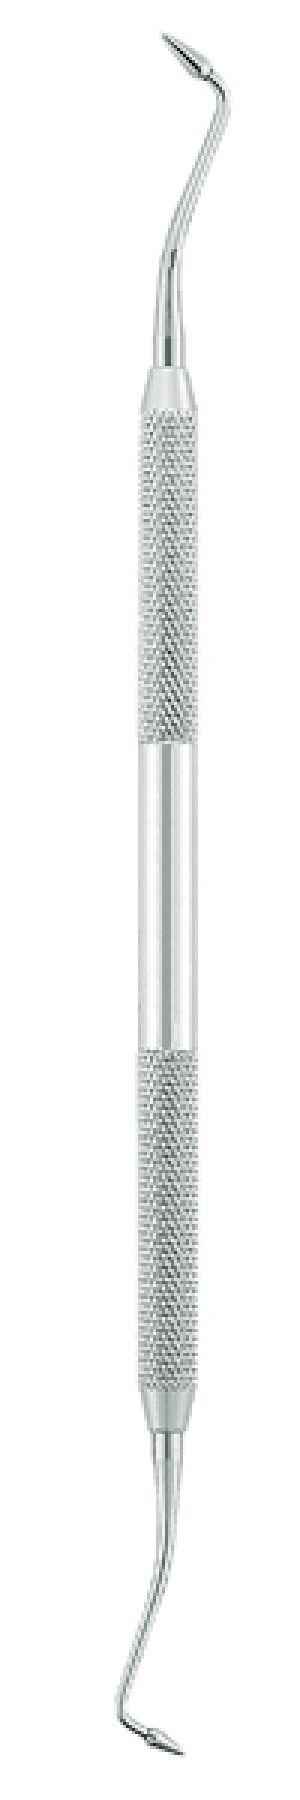 MI-73-103 Dental Wax & Modelling Carver